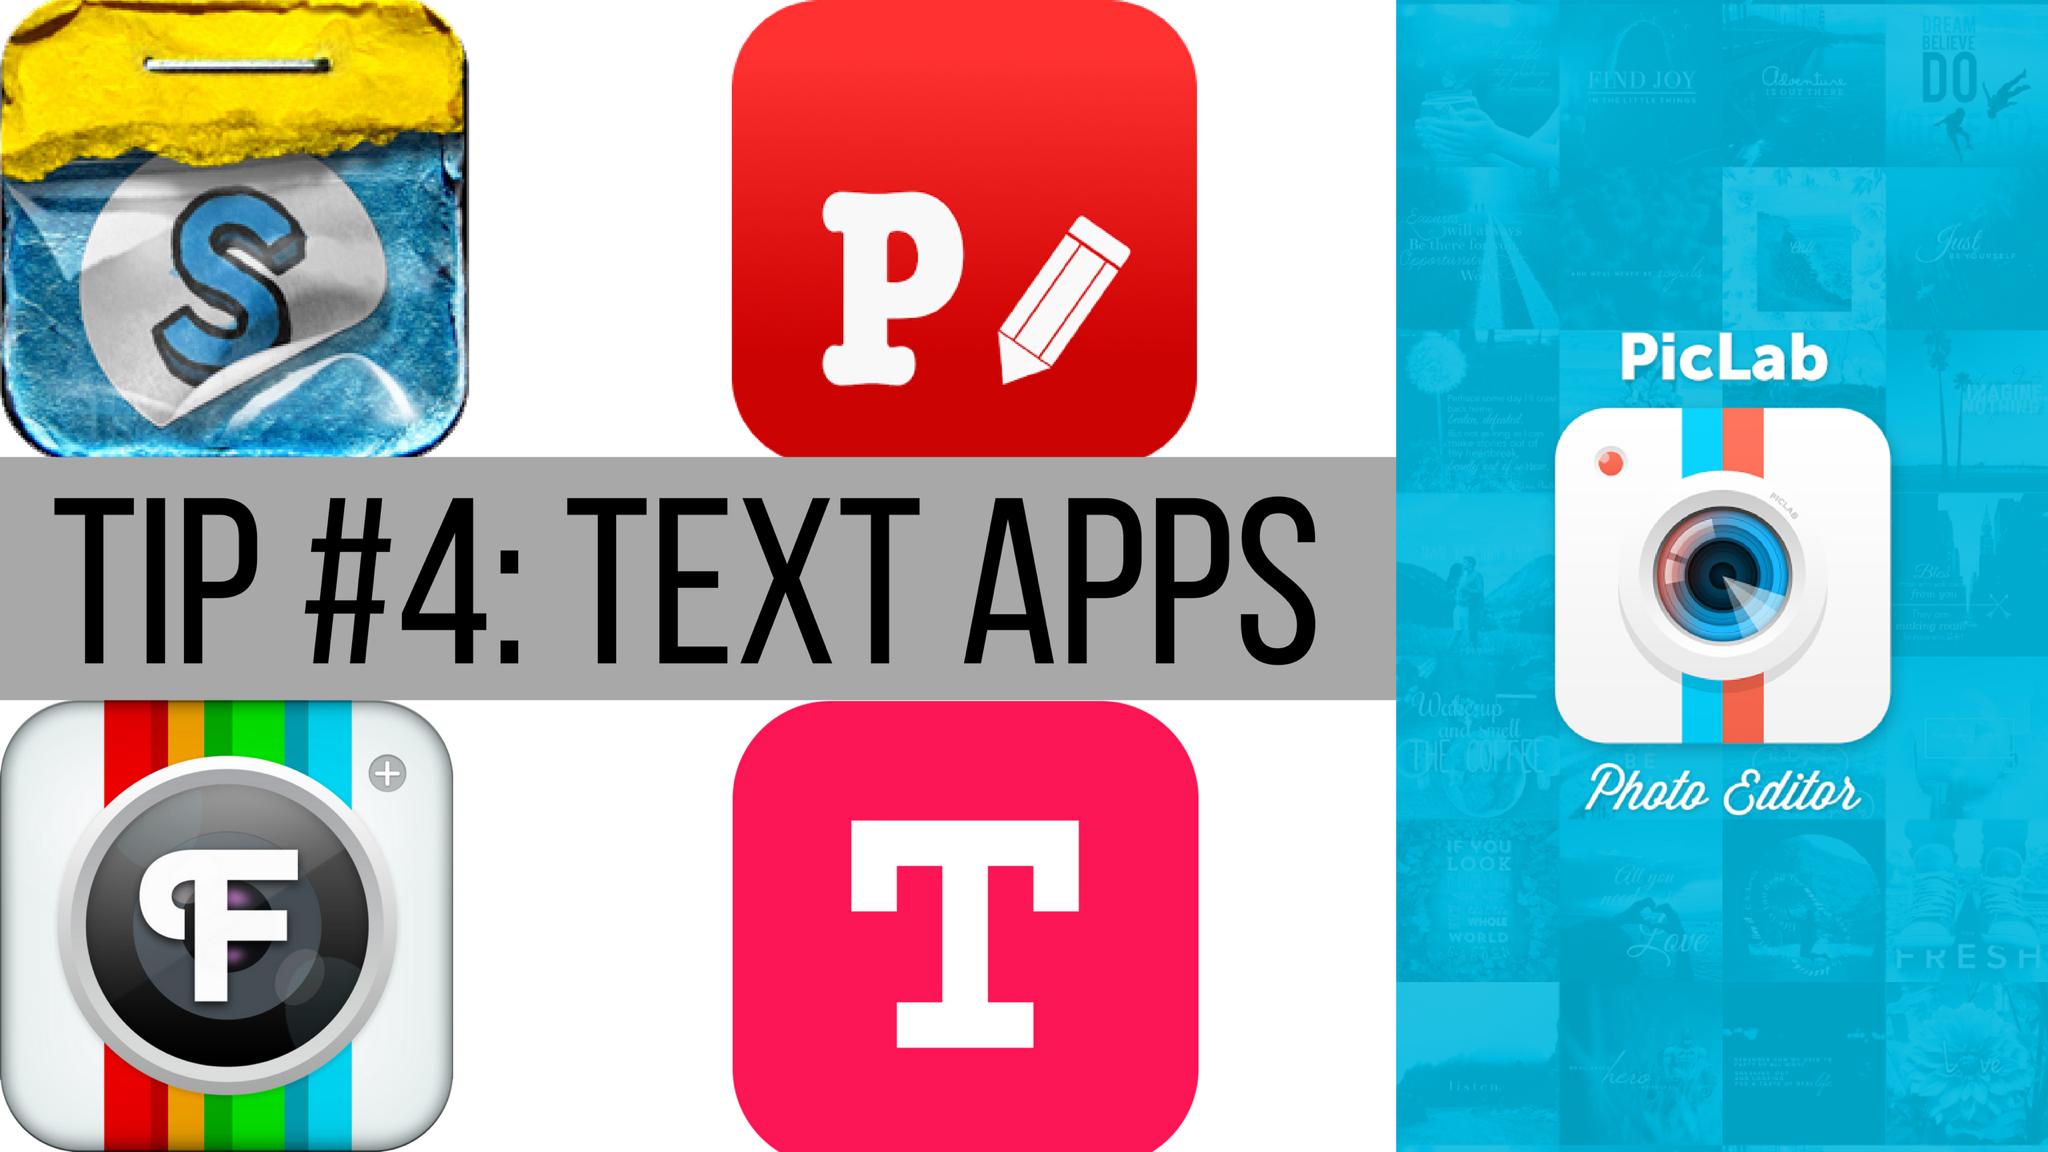 acdb658a8f811abc9f3c_TIP__4__Text_Apps-2.jpg